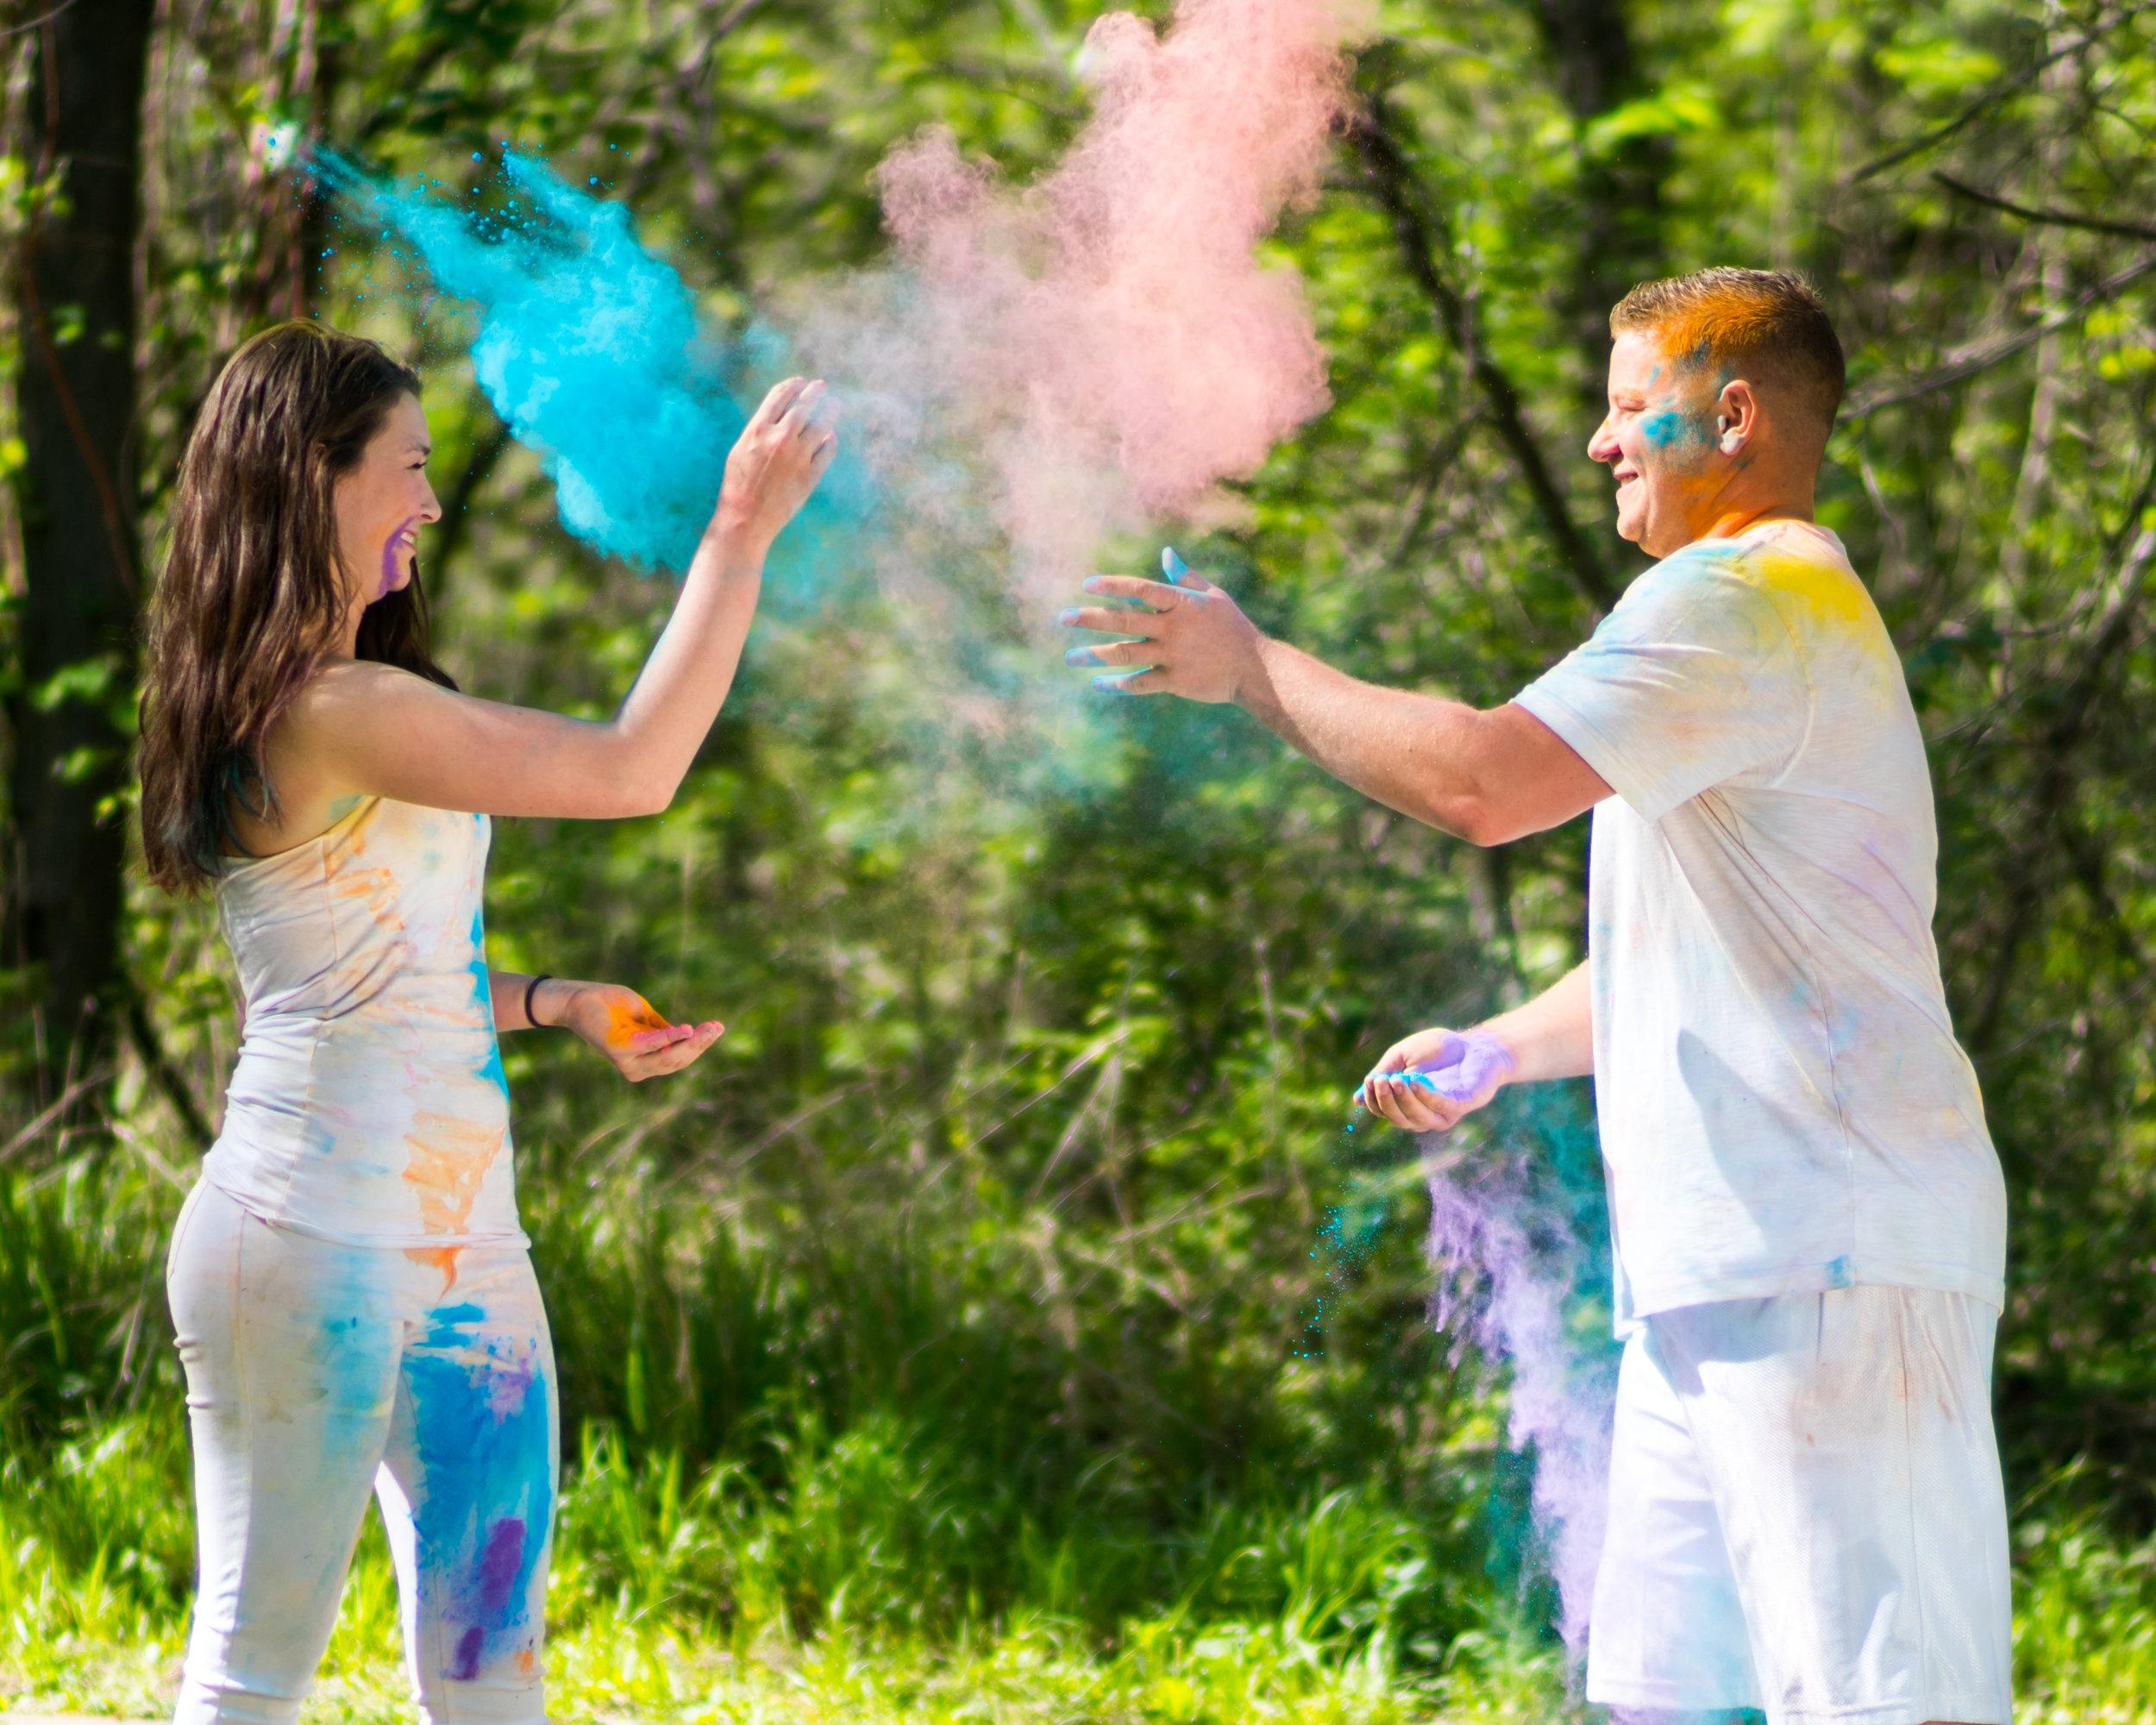 Dusti and Evan in a heated color powder fight, following the 2017 Dallas Color Run, photo by AJ Miragliotta